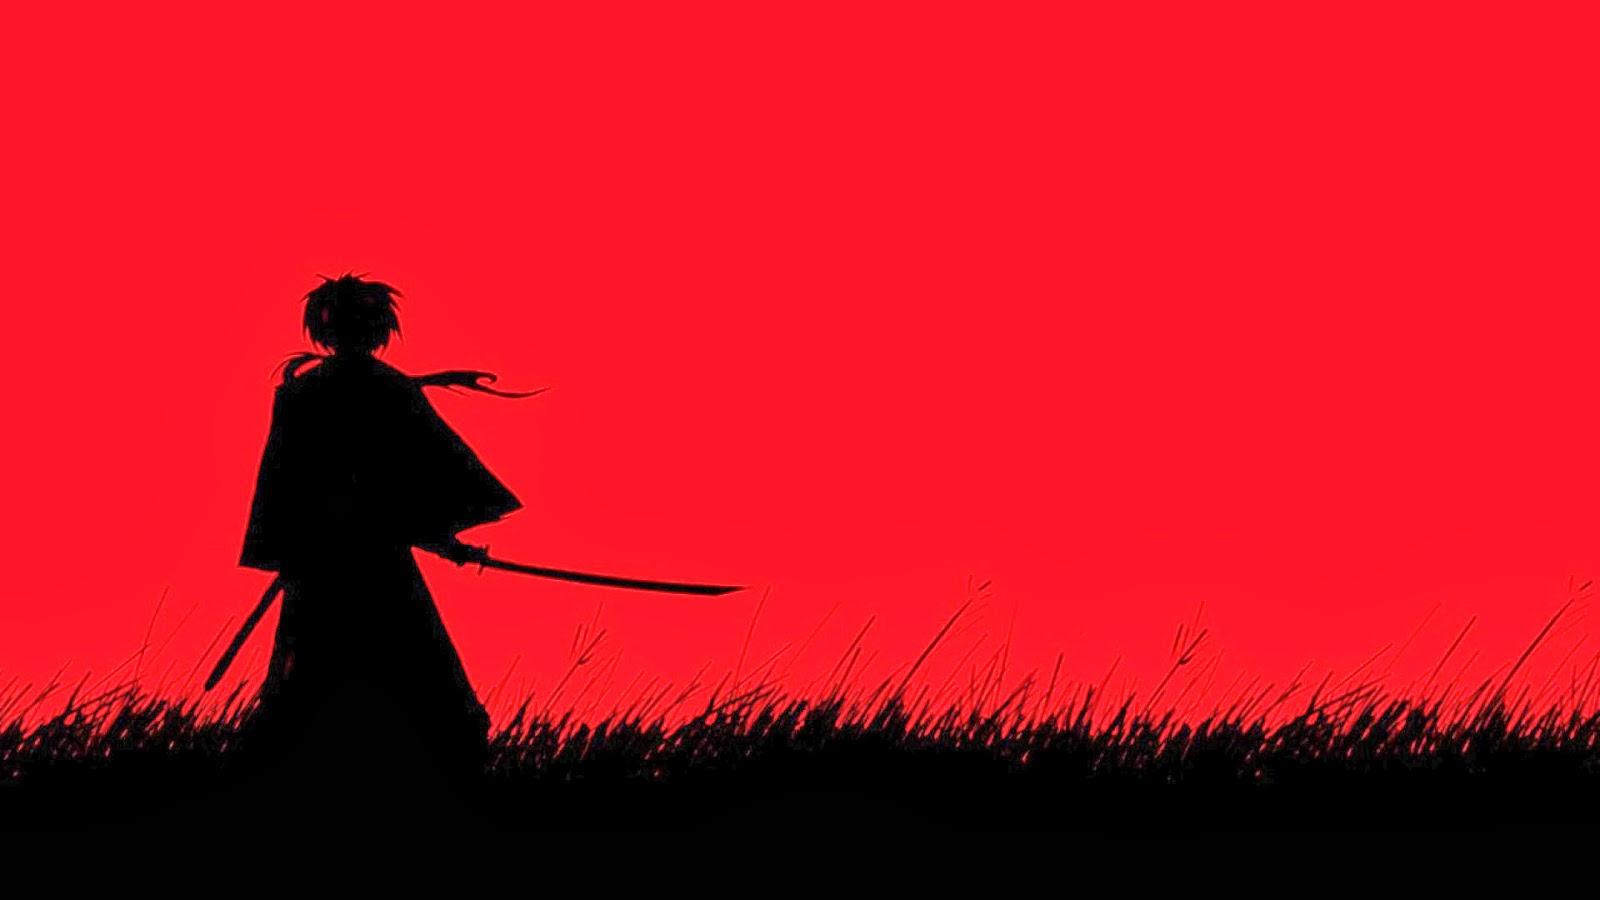 30 samurai wallpapers hd - photo #37